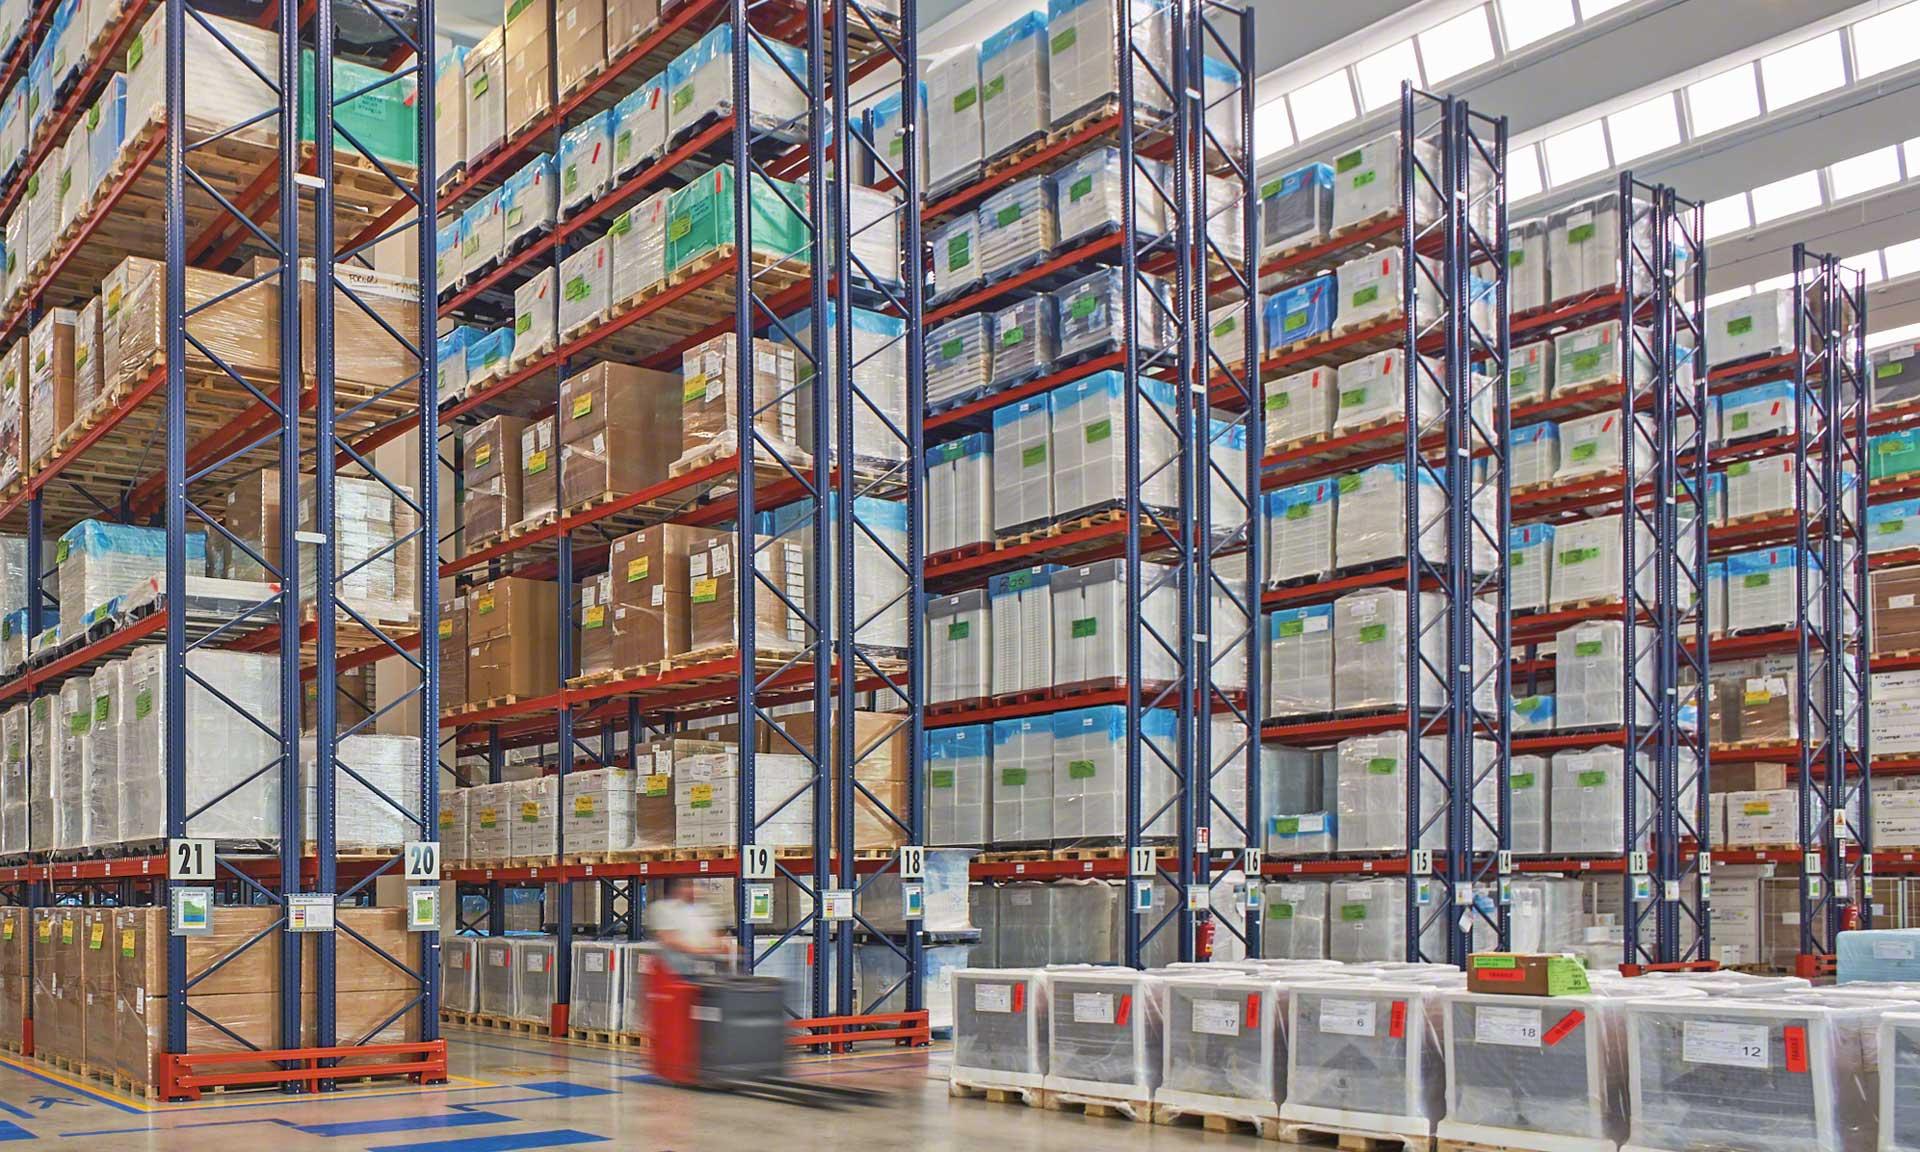 Chigiatto Transporti: medical supply storage